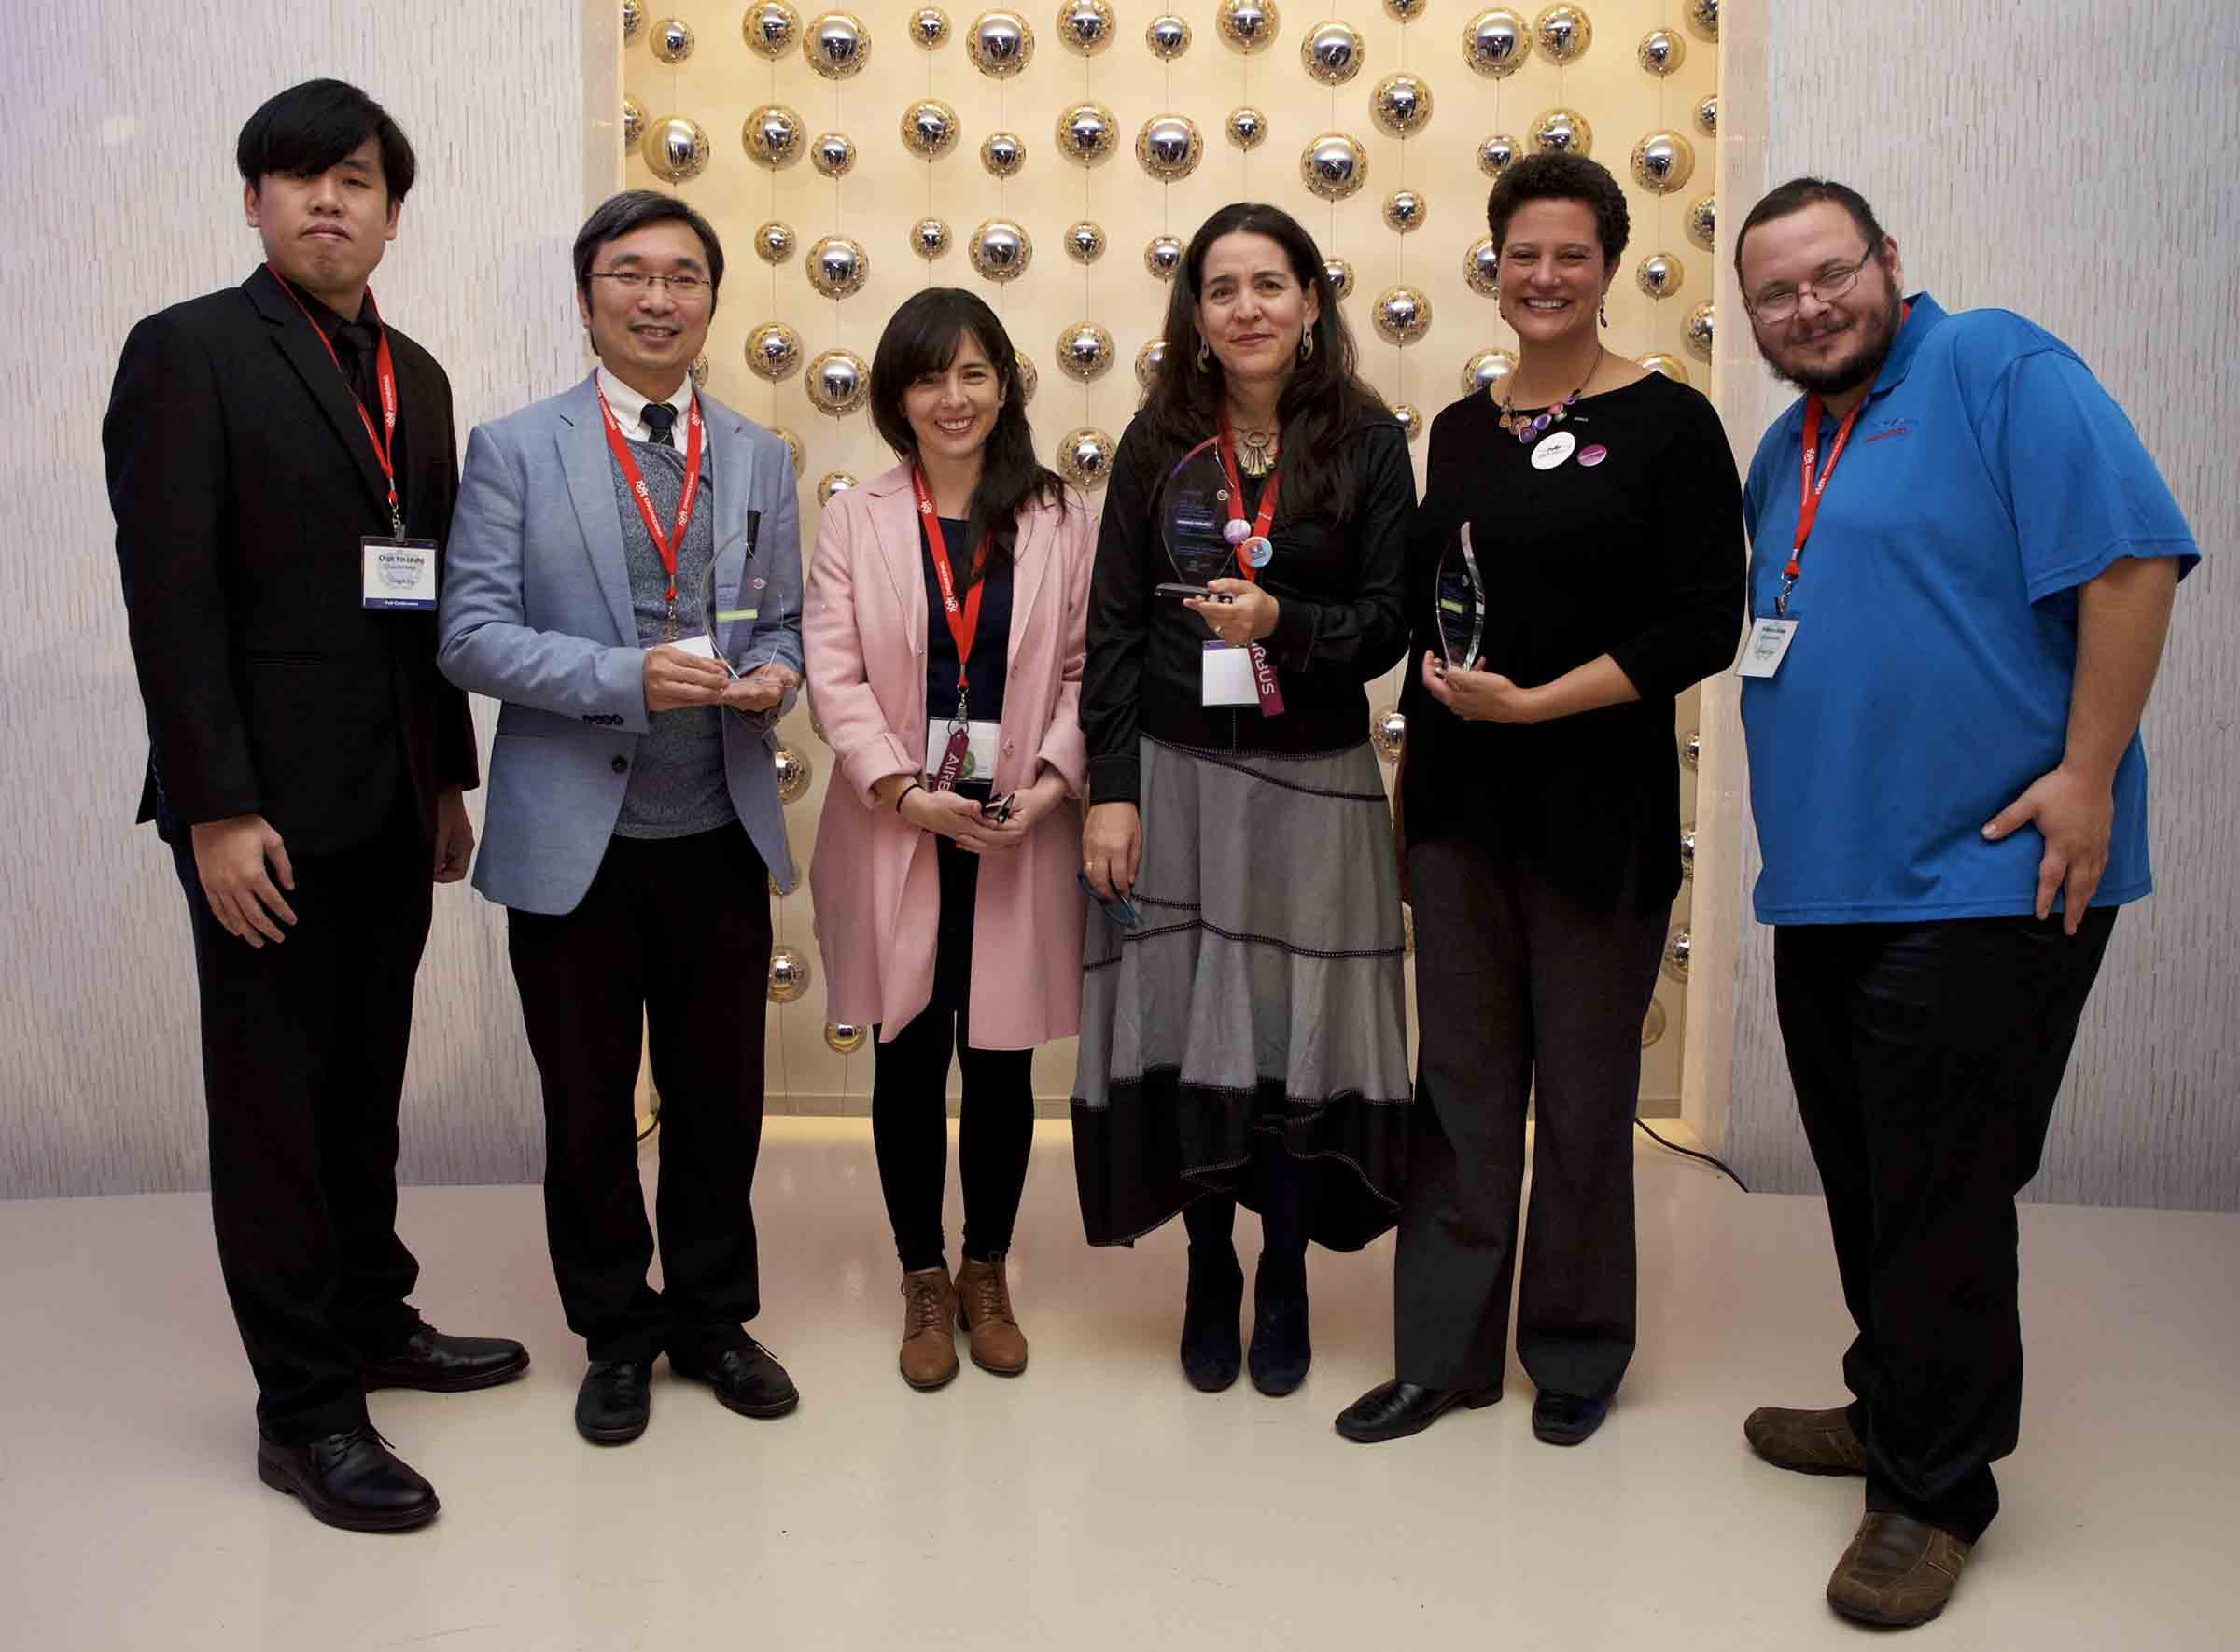 Chilean university wins 2018 Airbus GEDC Diversity Award